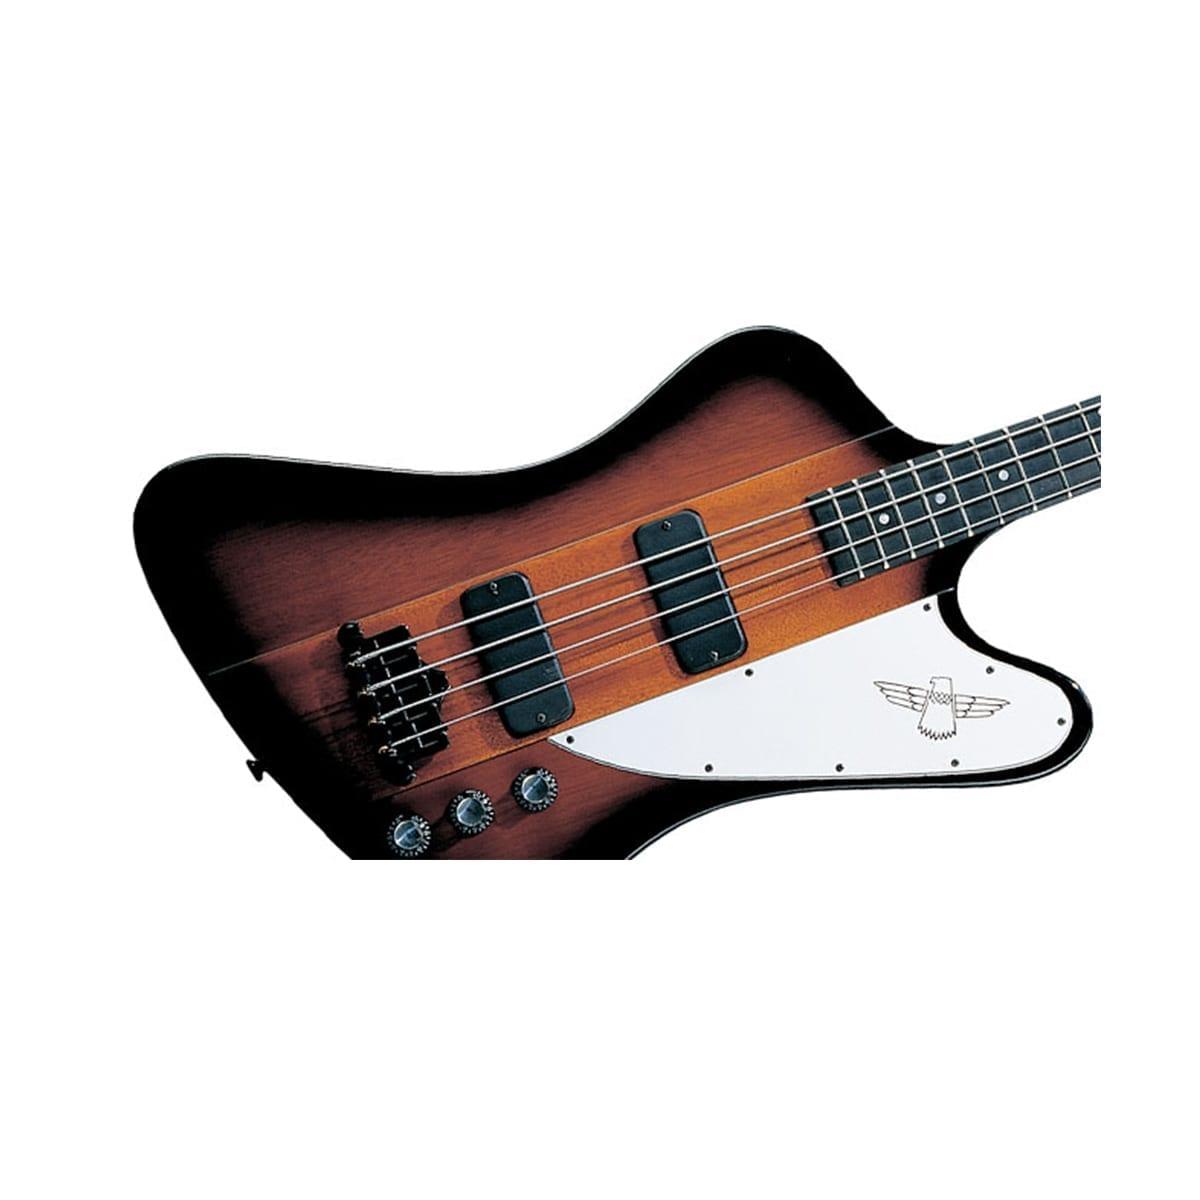 Epiphone Thunderbird Classic IV Bass USA Pickup